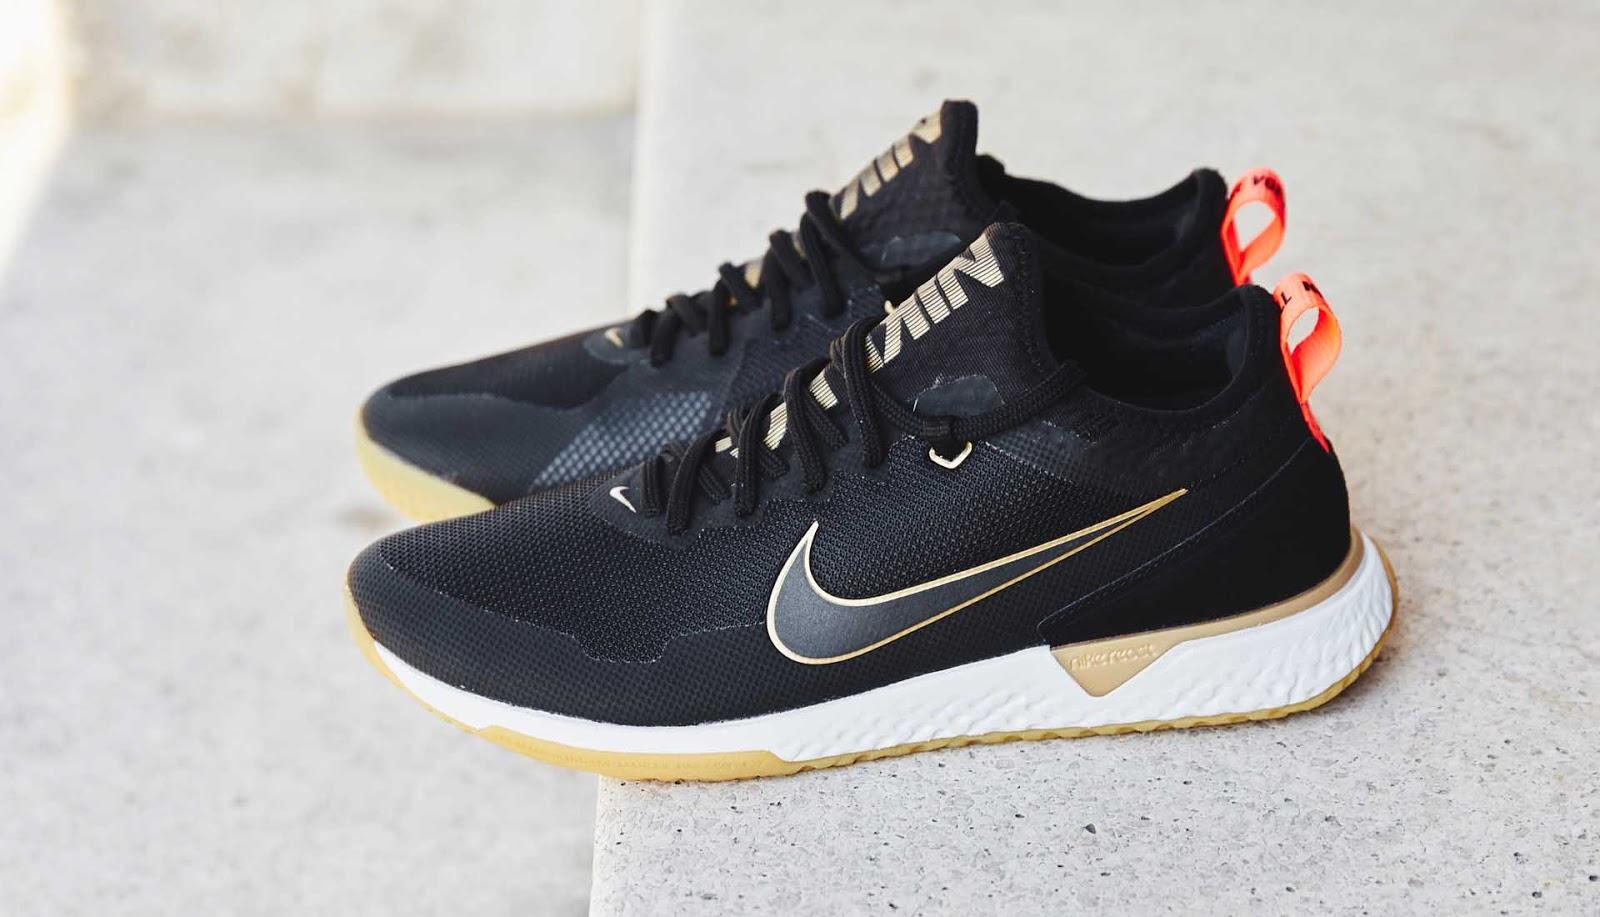 d3bc02e178f Black   Metallic Gold Nike F.C. React Football Shoes Released ...